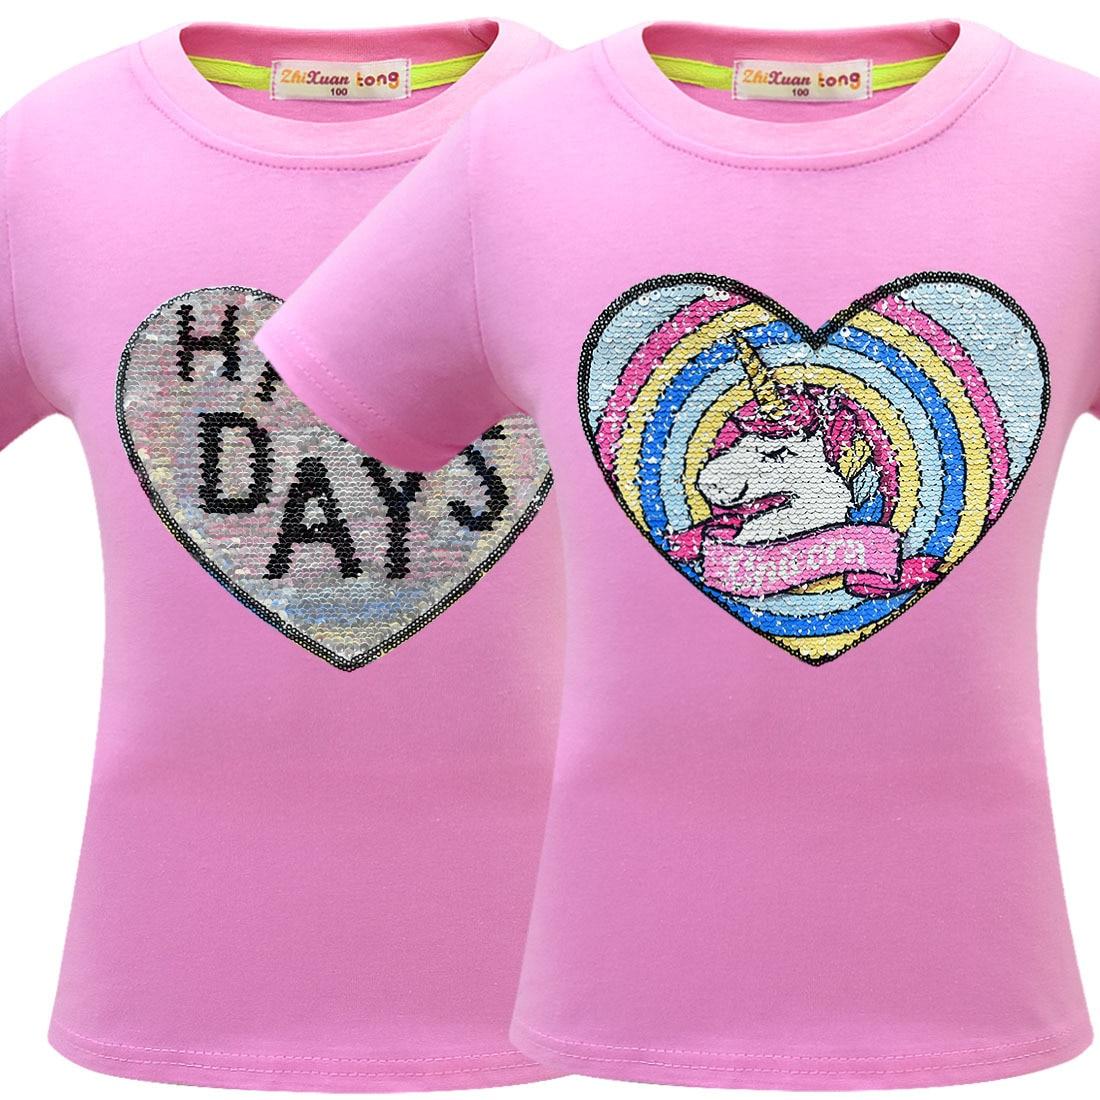 NUOVO prestonplayz Bambini Ragazzi Ragazze 100/% COTONE T-shirt Top Outfit Tshirts